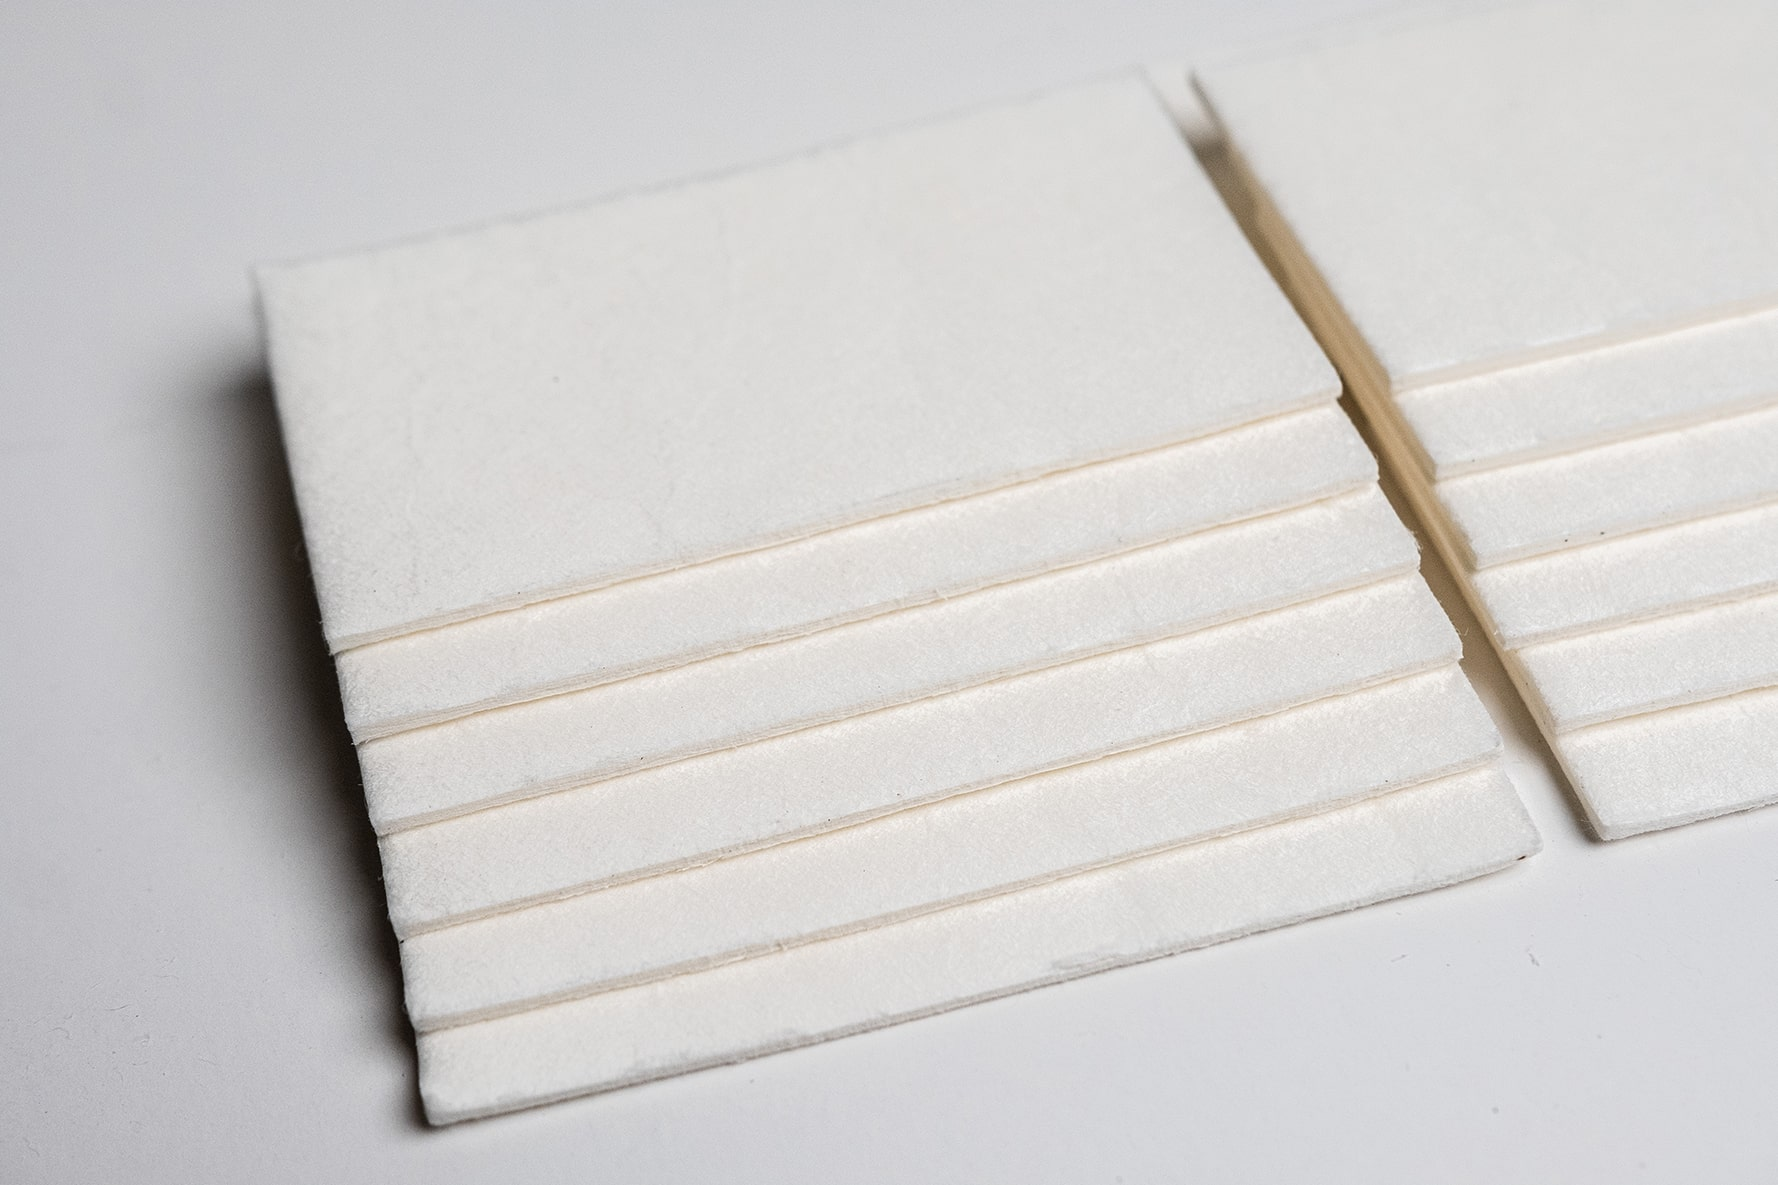 blotting paper - blotter paper